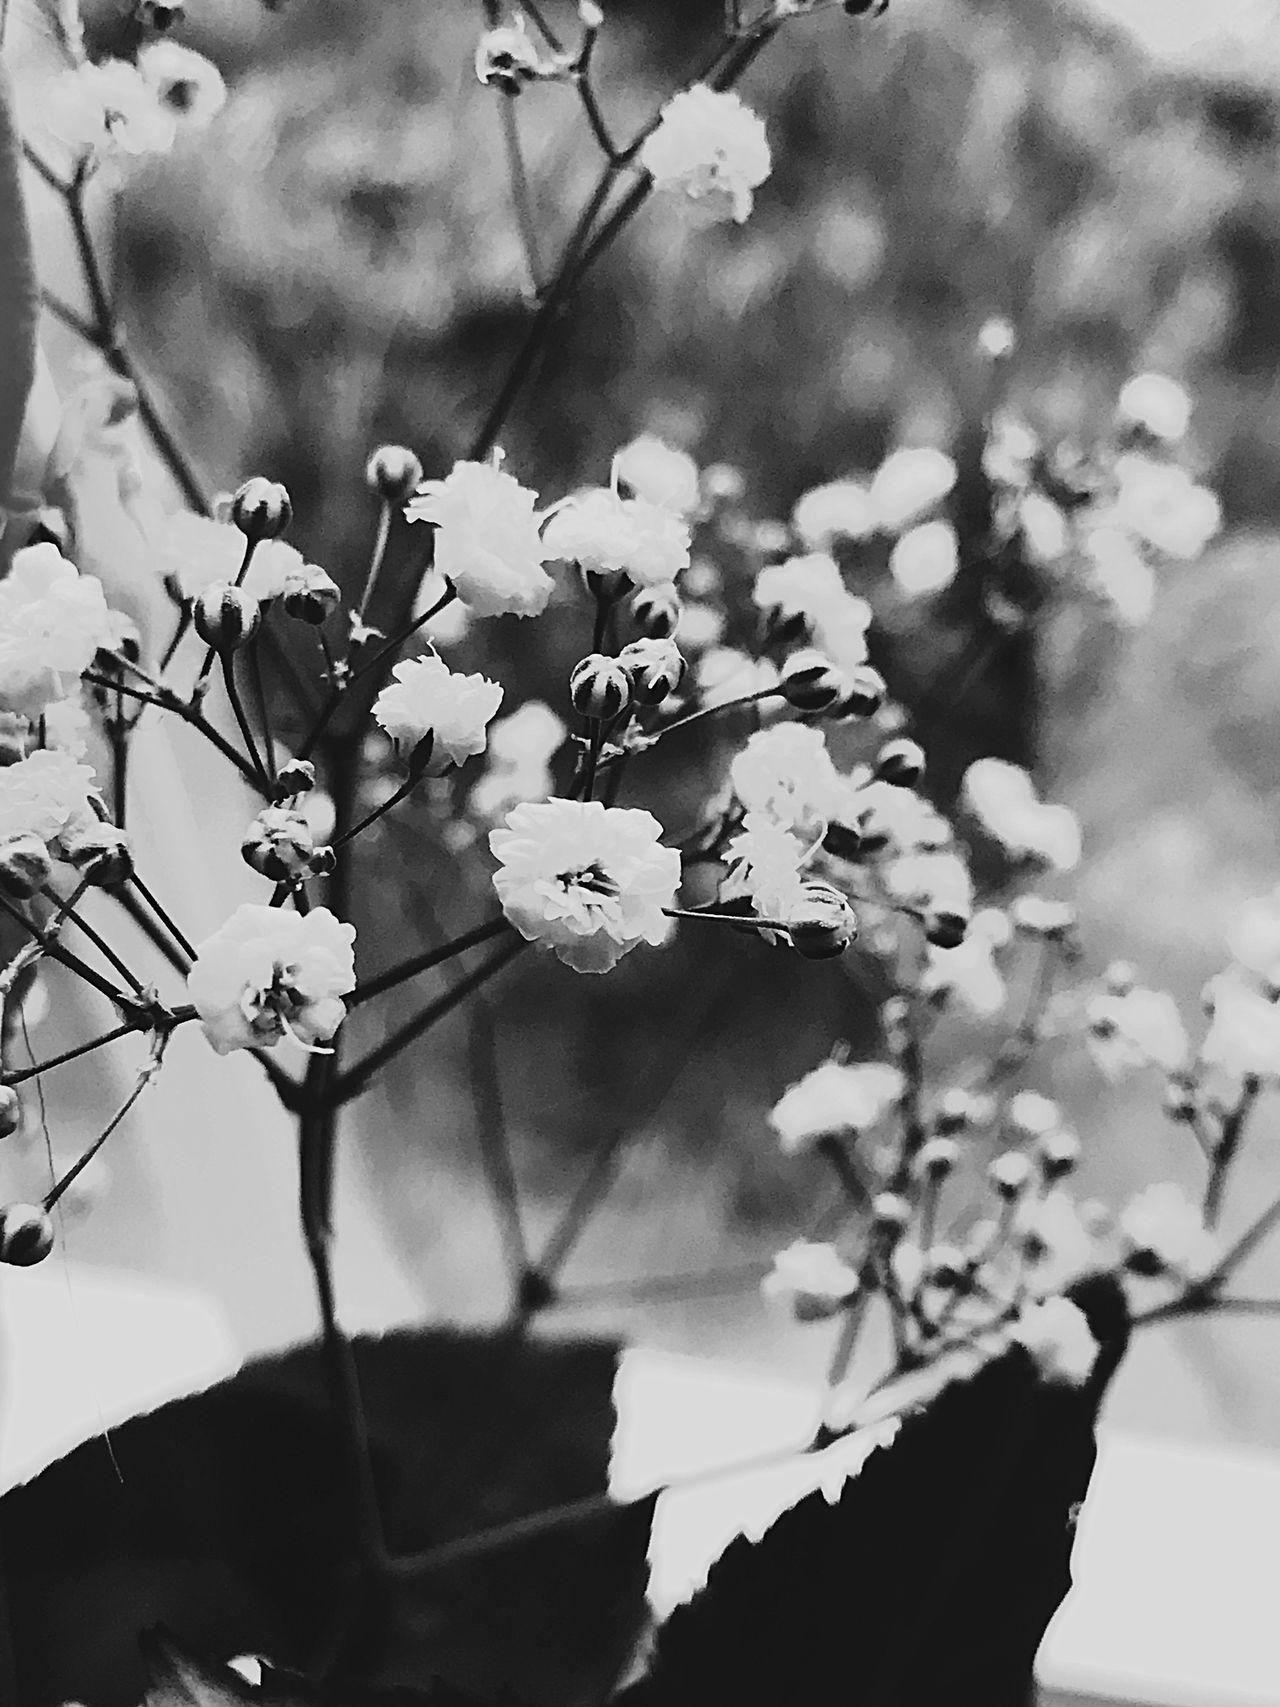 Flowers Blurry